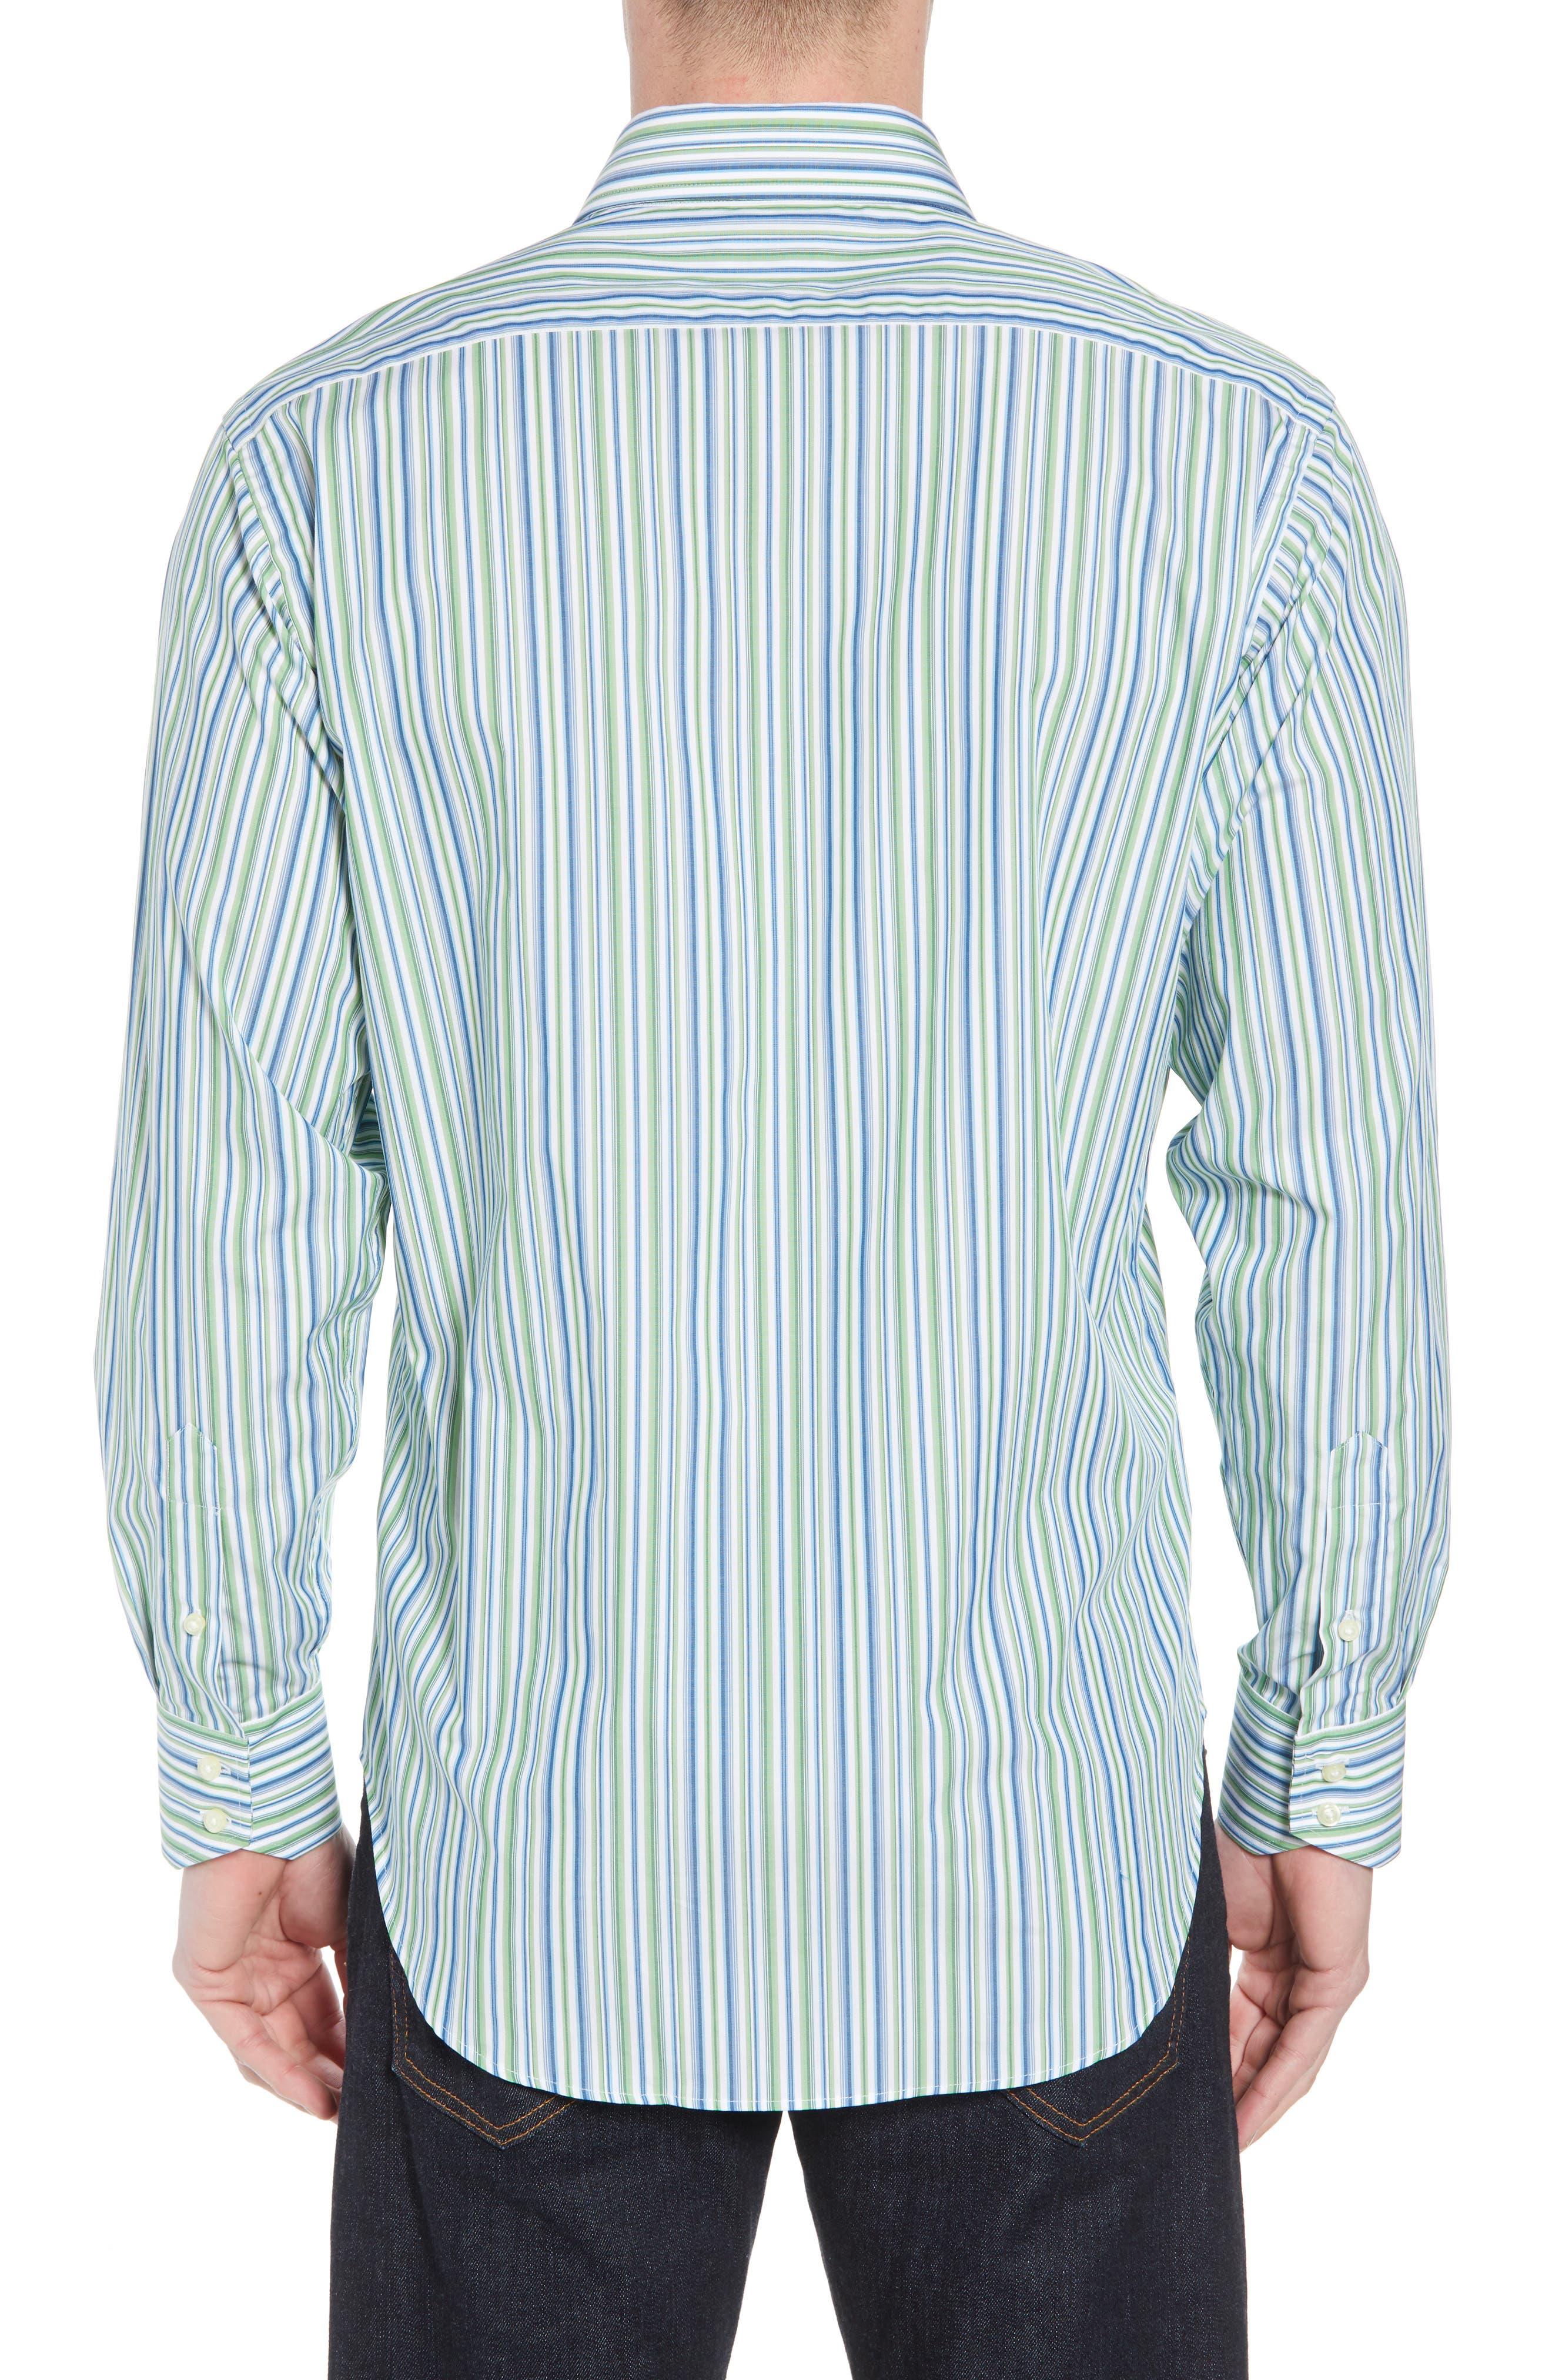 Regular Fit Stripe Sport Shirt,                             Alternate thumbnail 2, color,                             300